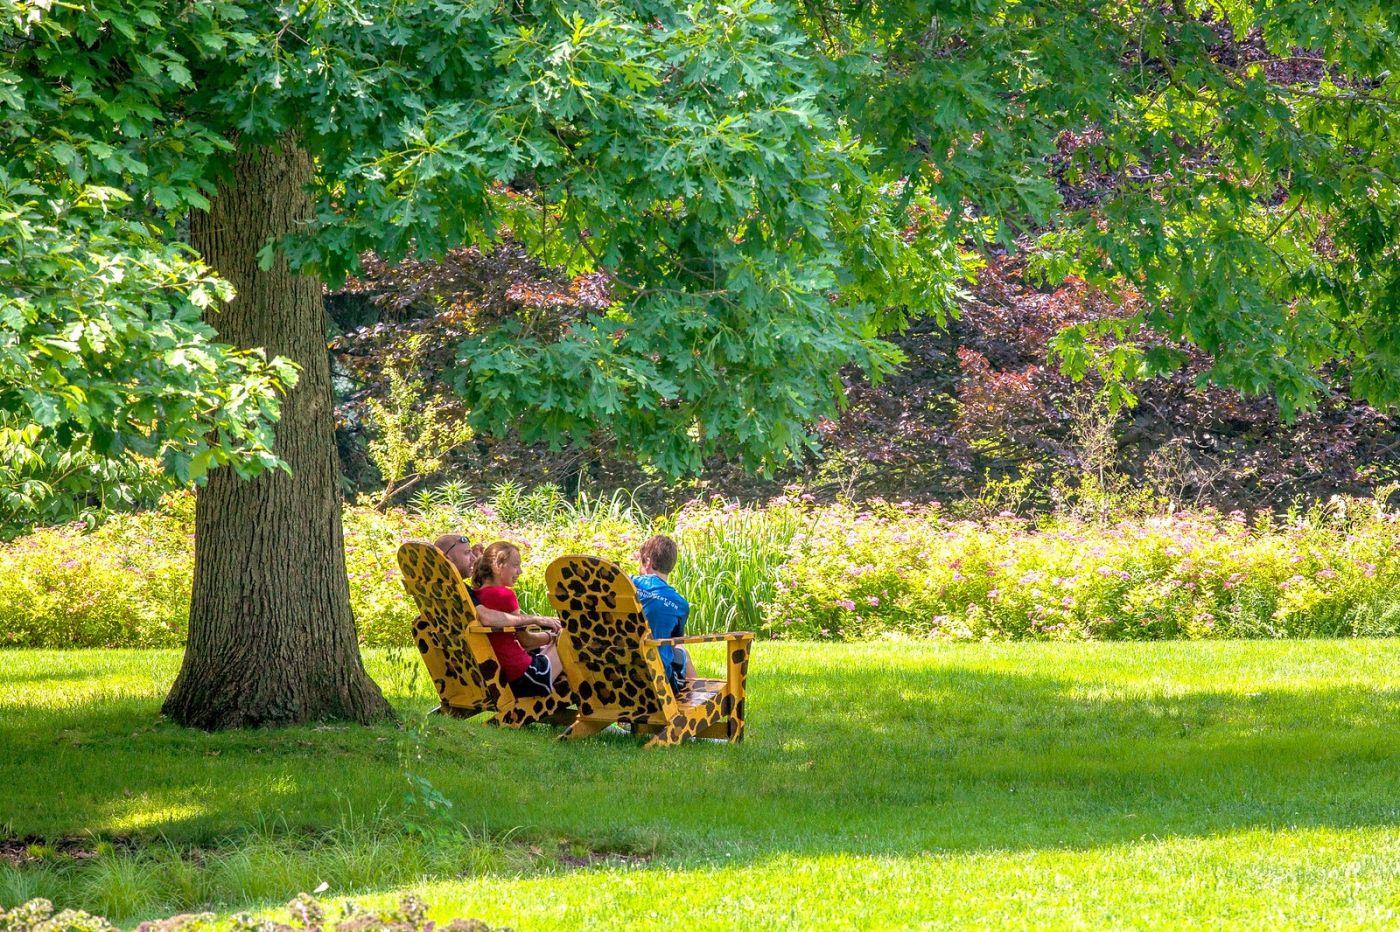 Chanticleer花园,享受大自然_图1-25